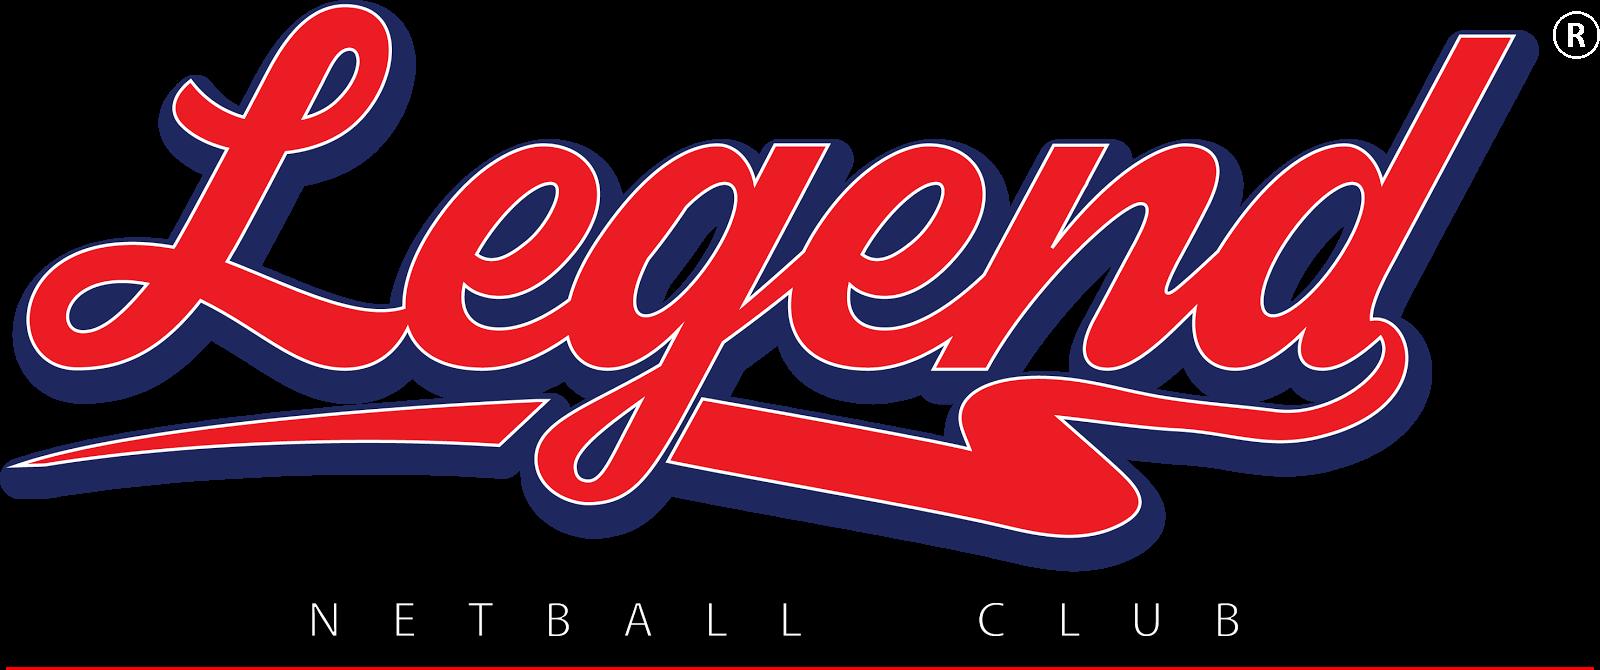 Legend Netball Club (MALAYSIA)